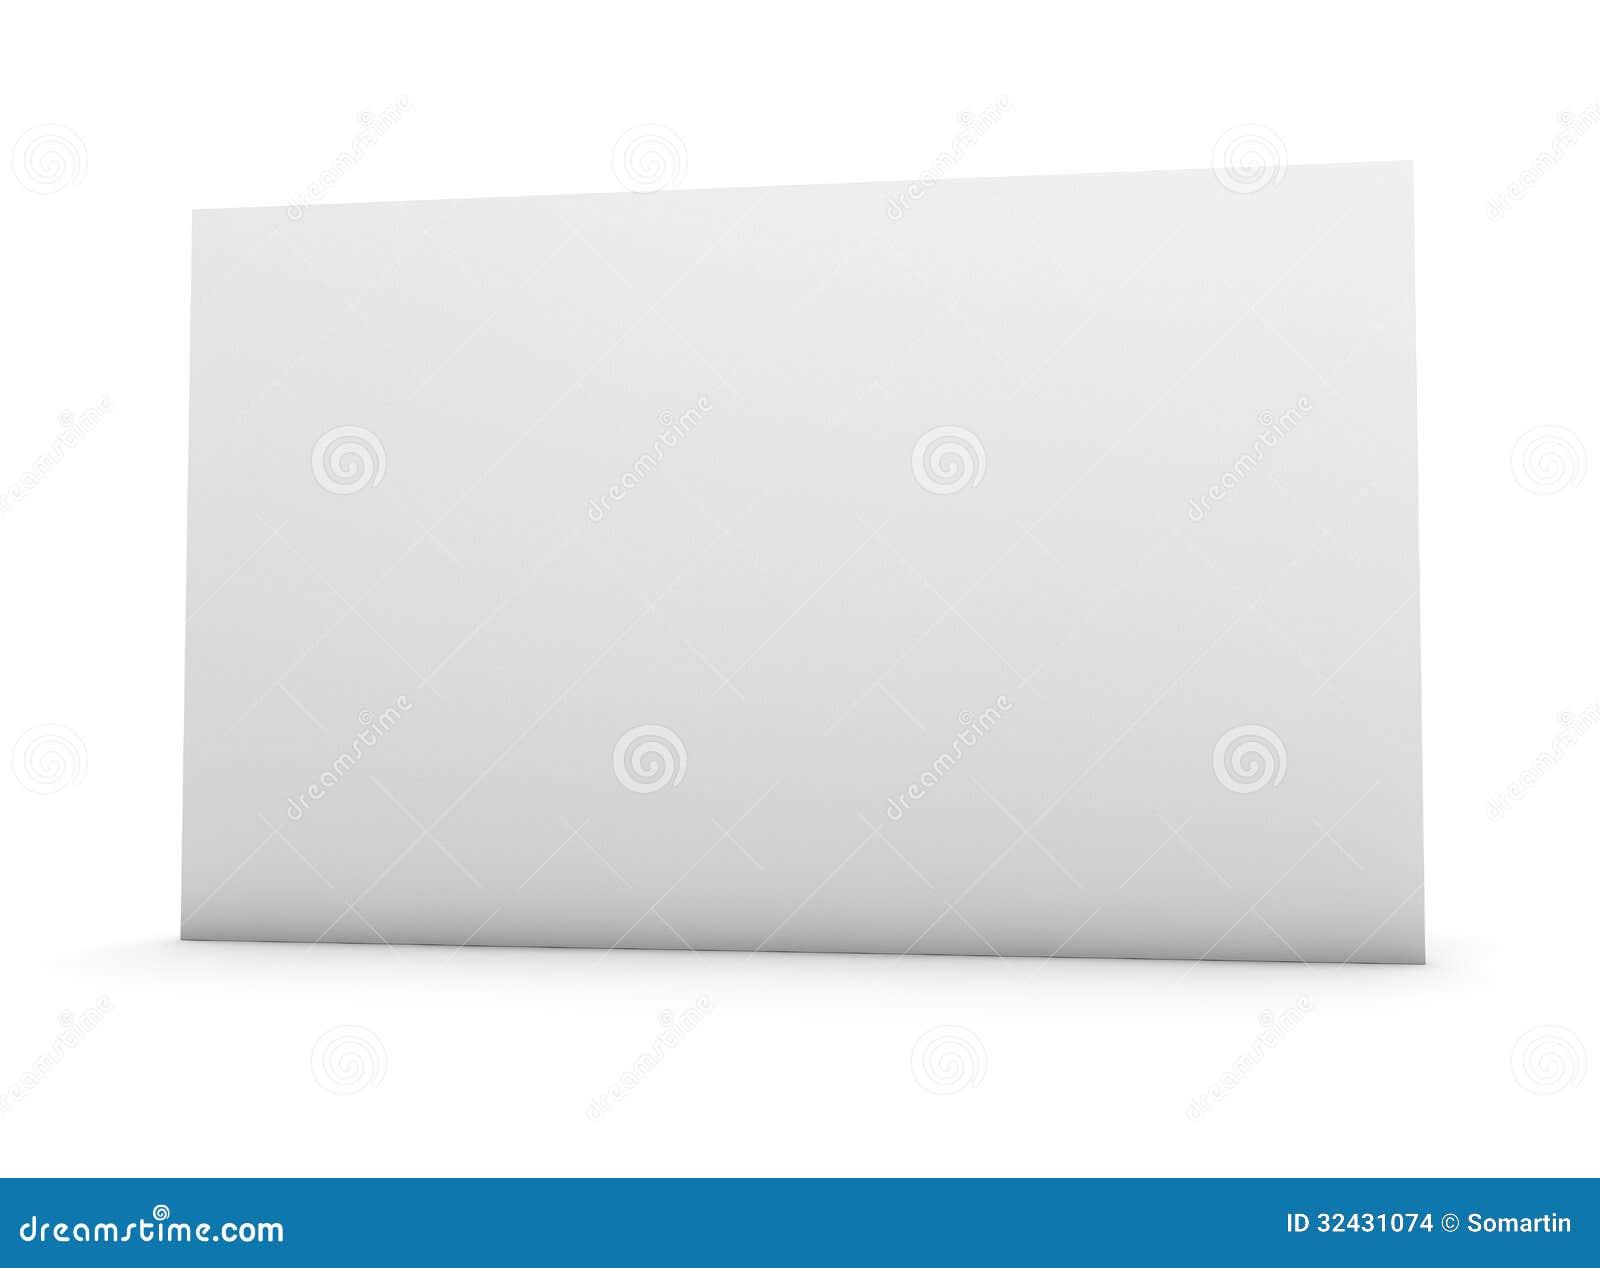 blank business card stock - Ideal.vistalist.co